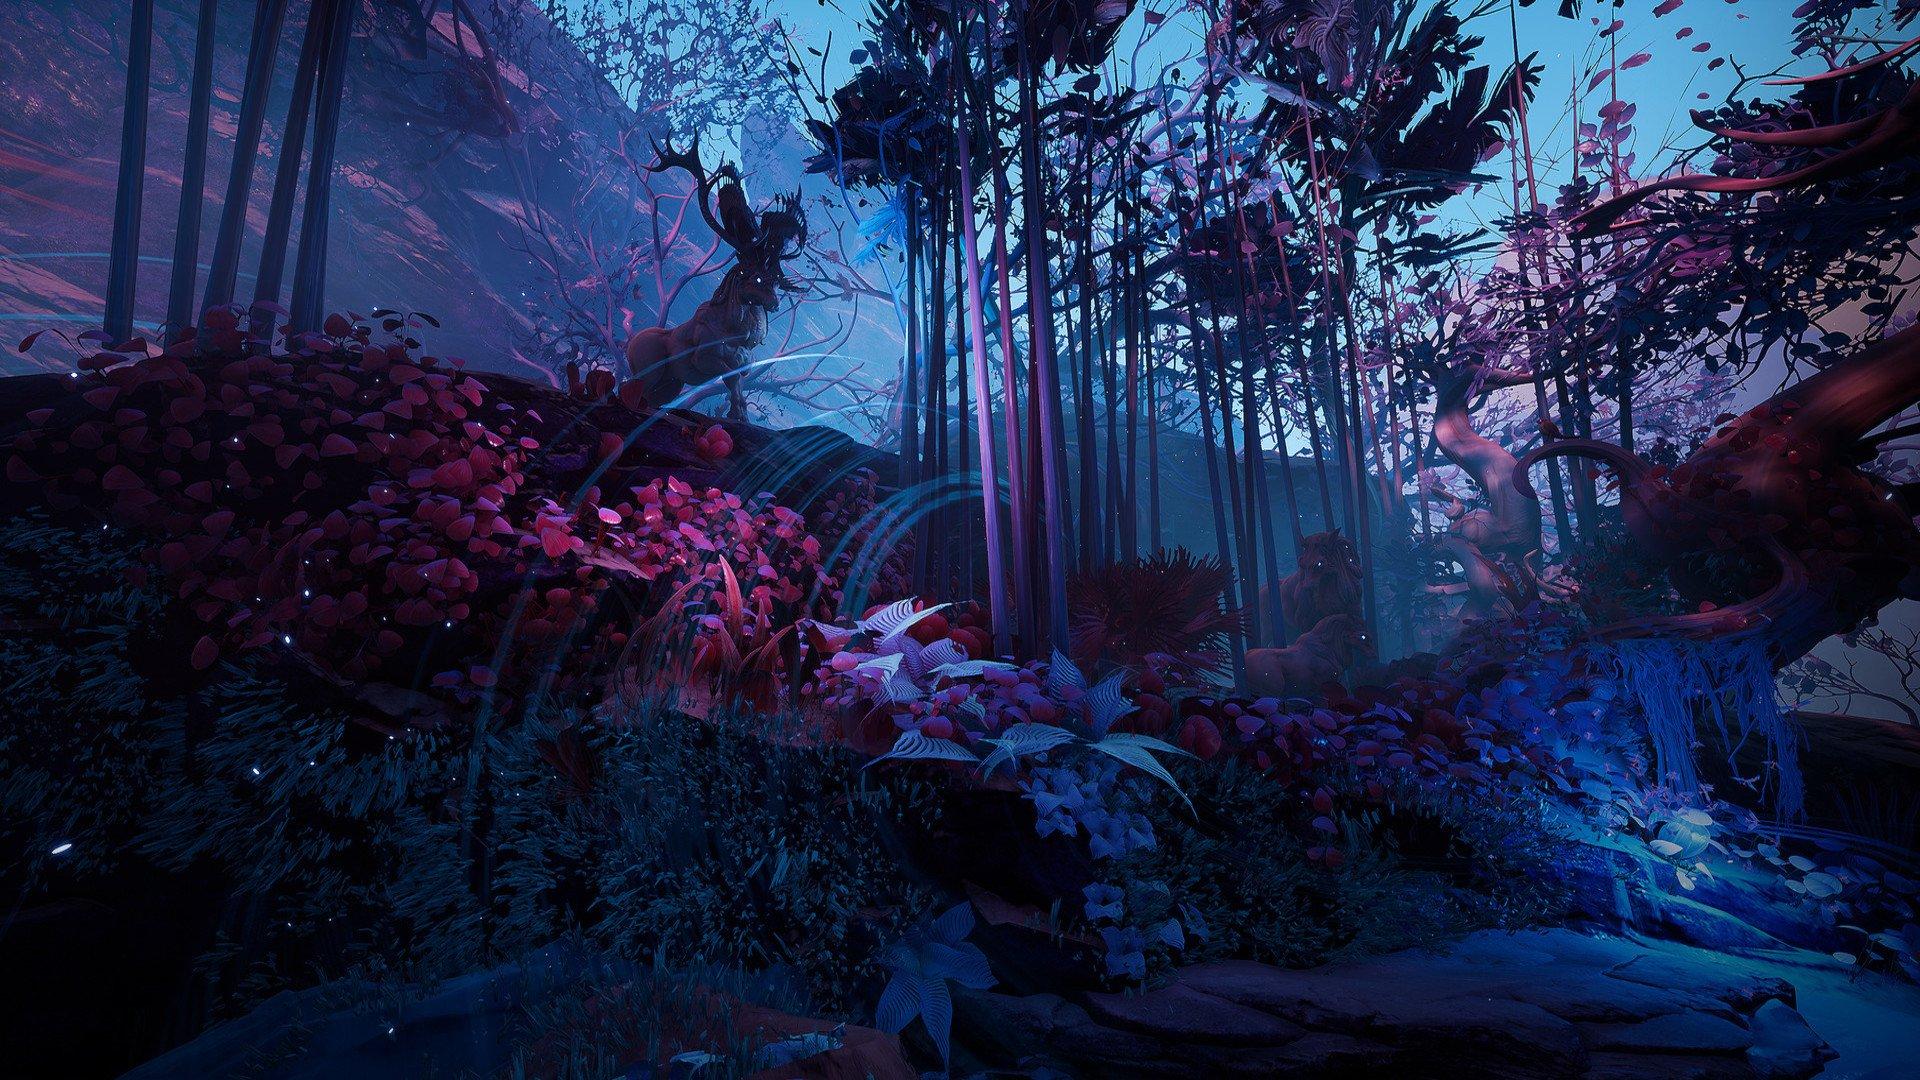 Mystic Forest Fondo De Pantalla Hd Fondo De Escritorio